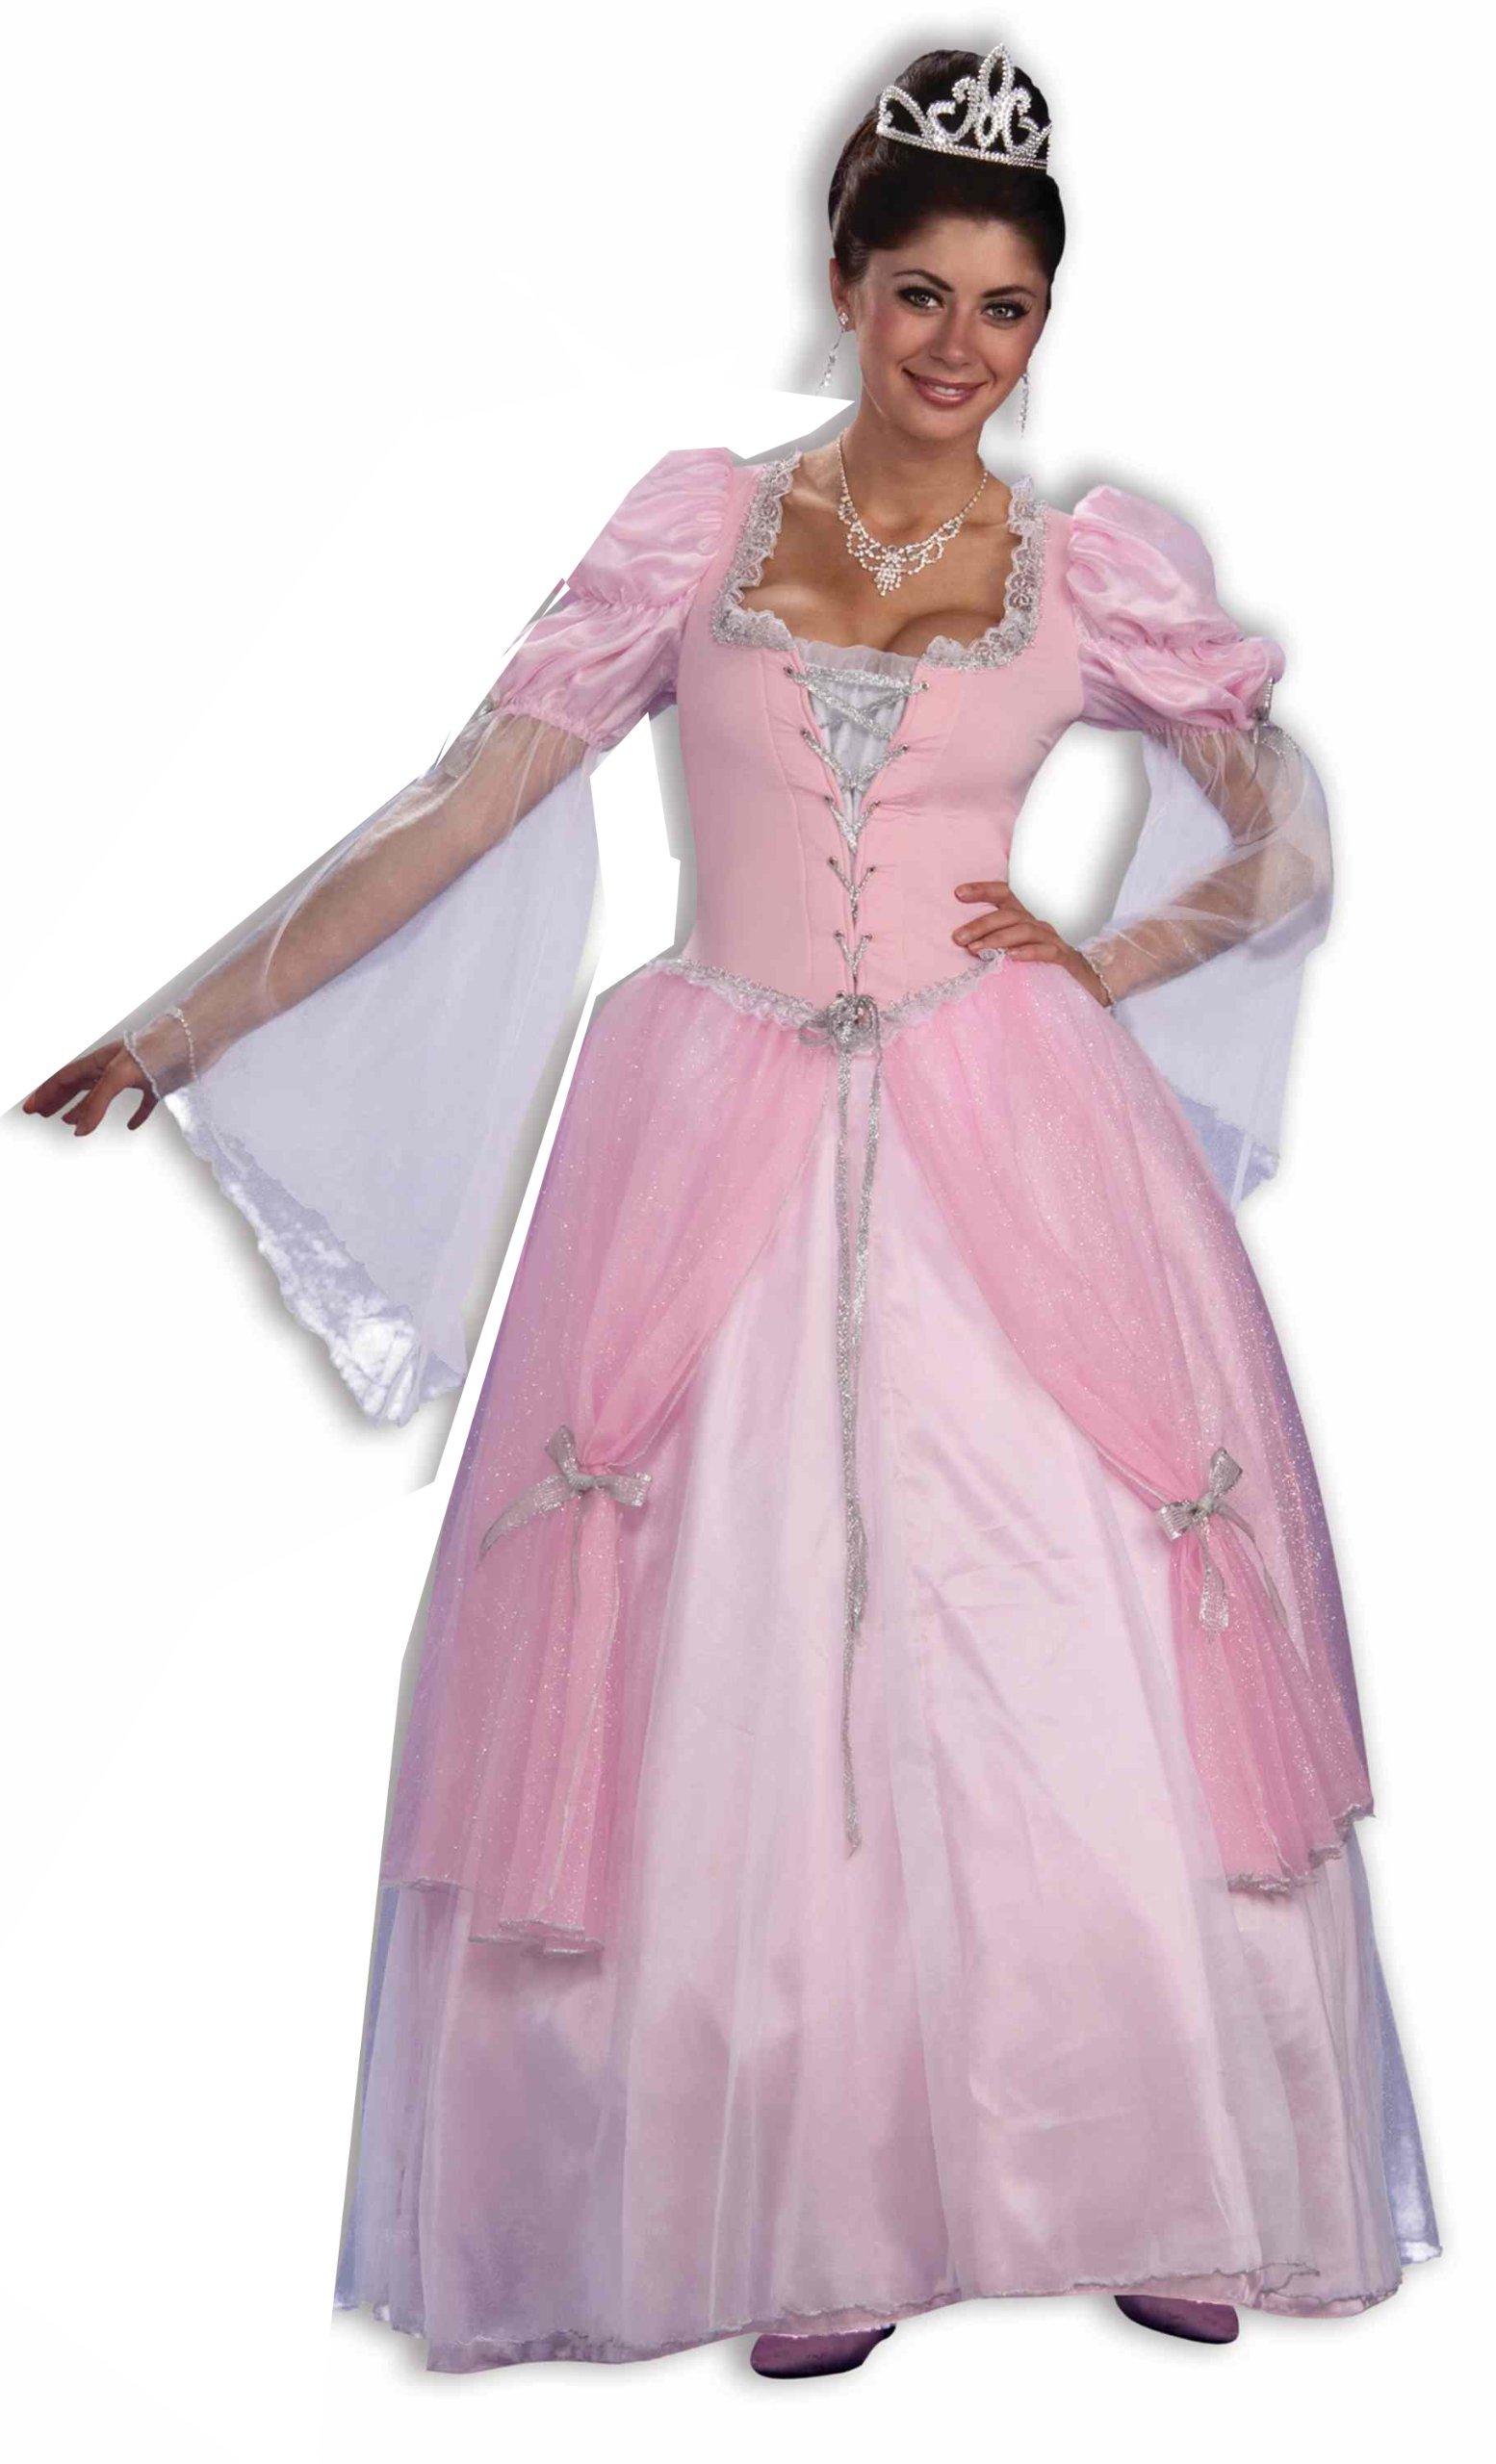 Forum Fairy Tales Fashions Fairy Tale Princess Dress, Pink, Standard Costume